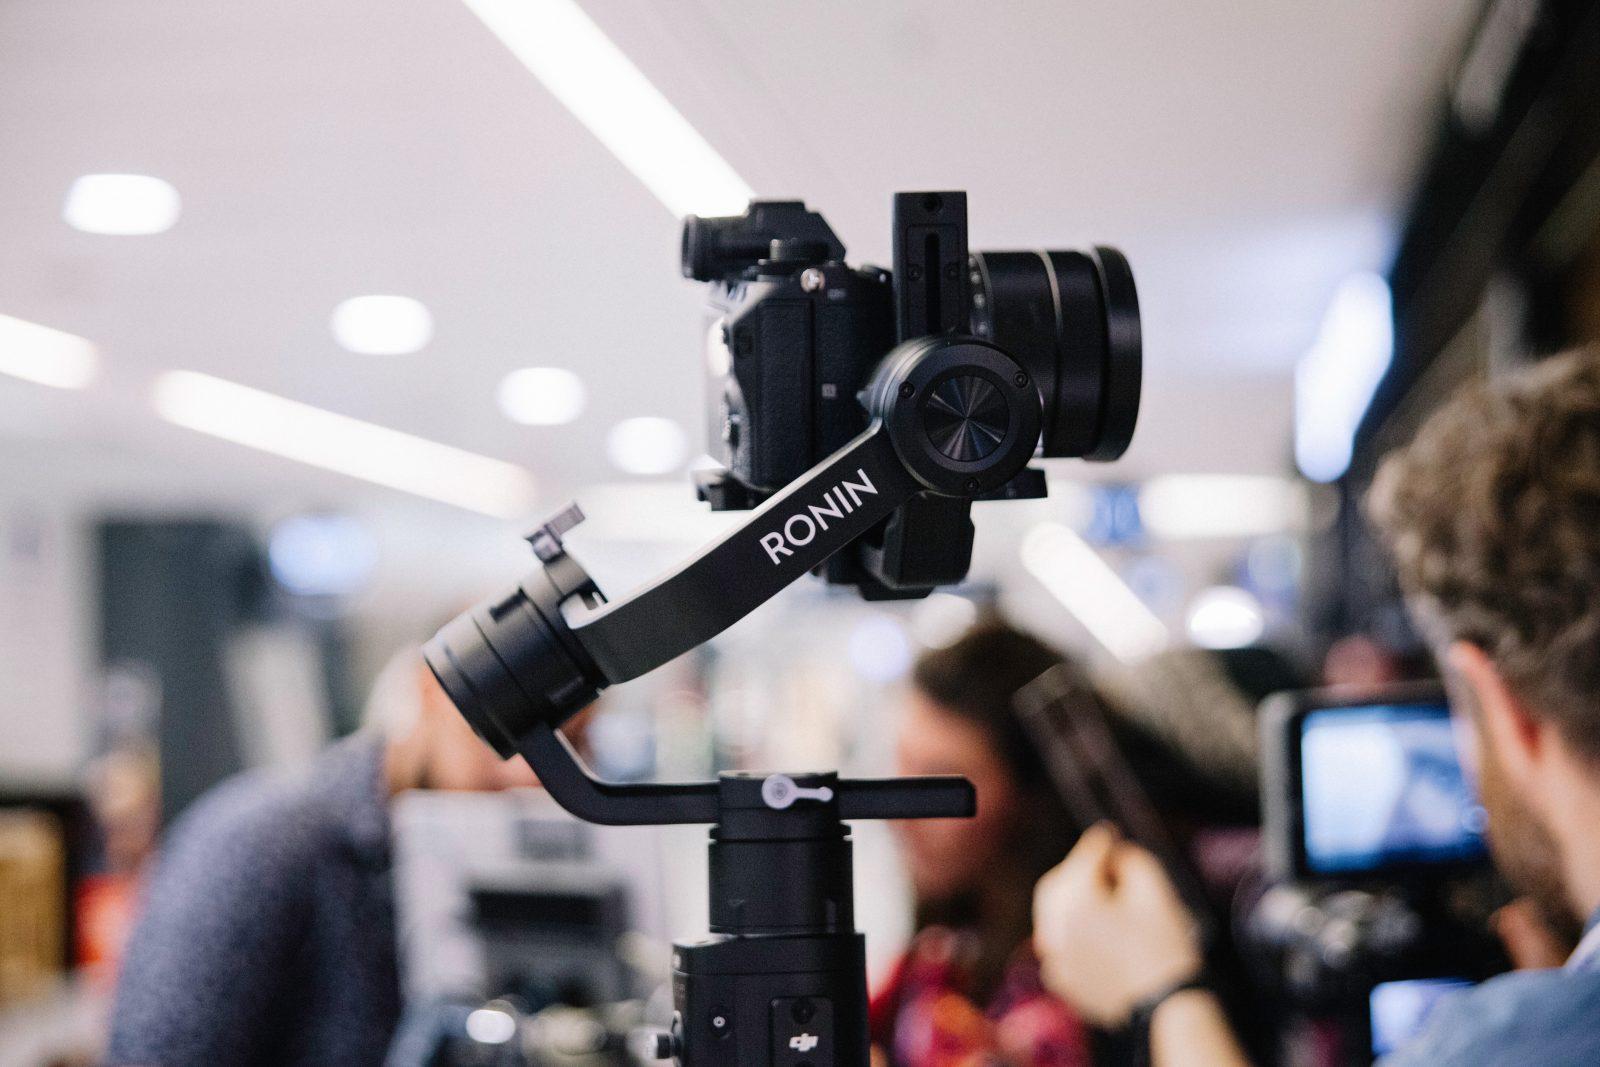 black Ronin DSLR camera